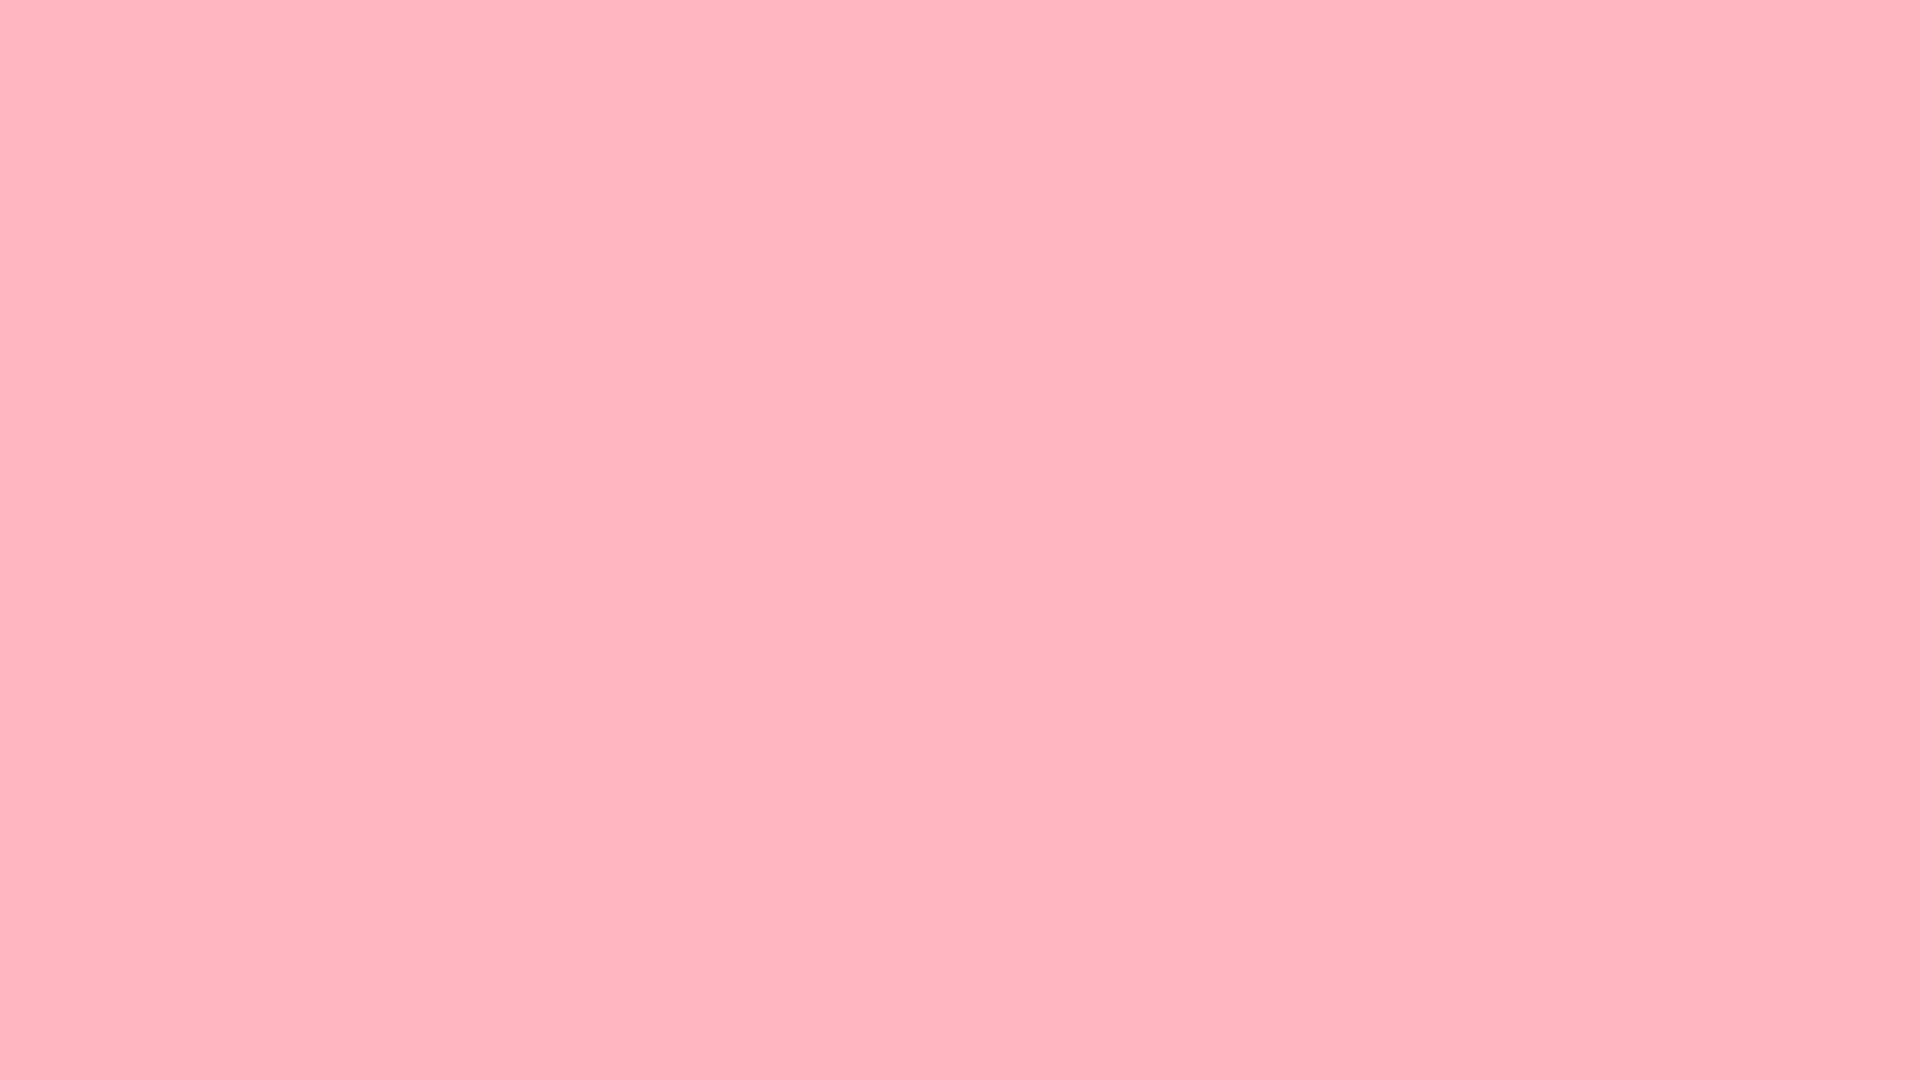 Light Pink Wallpaper 72 Images